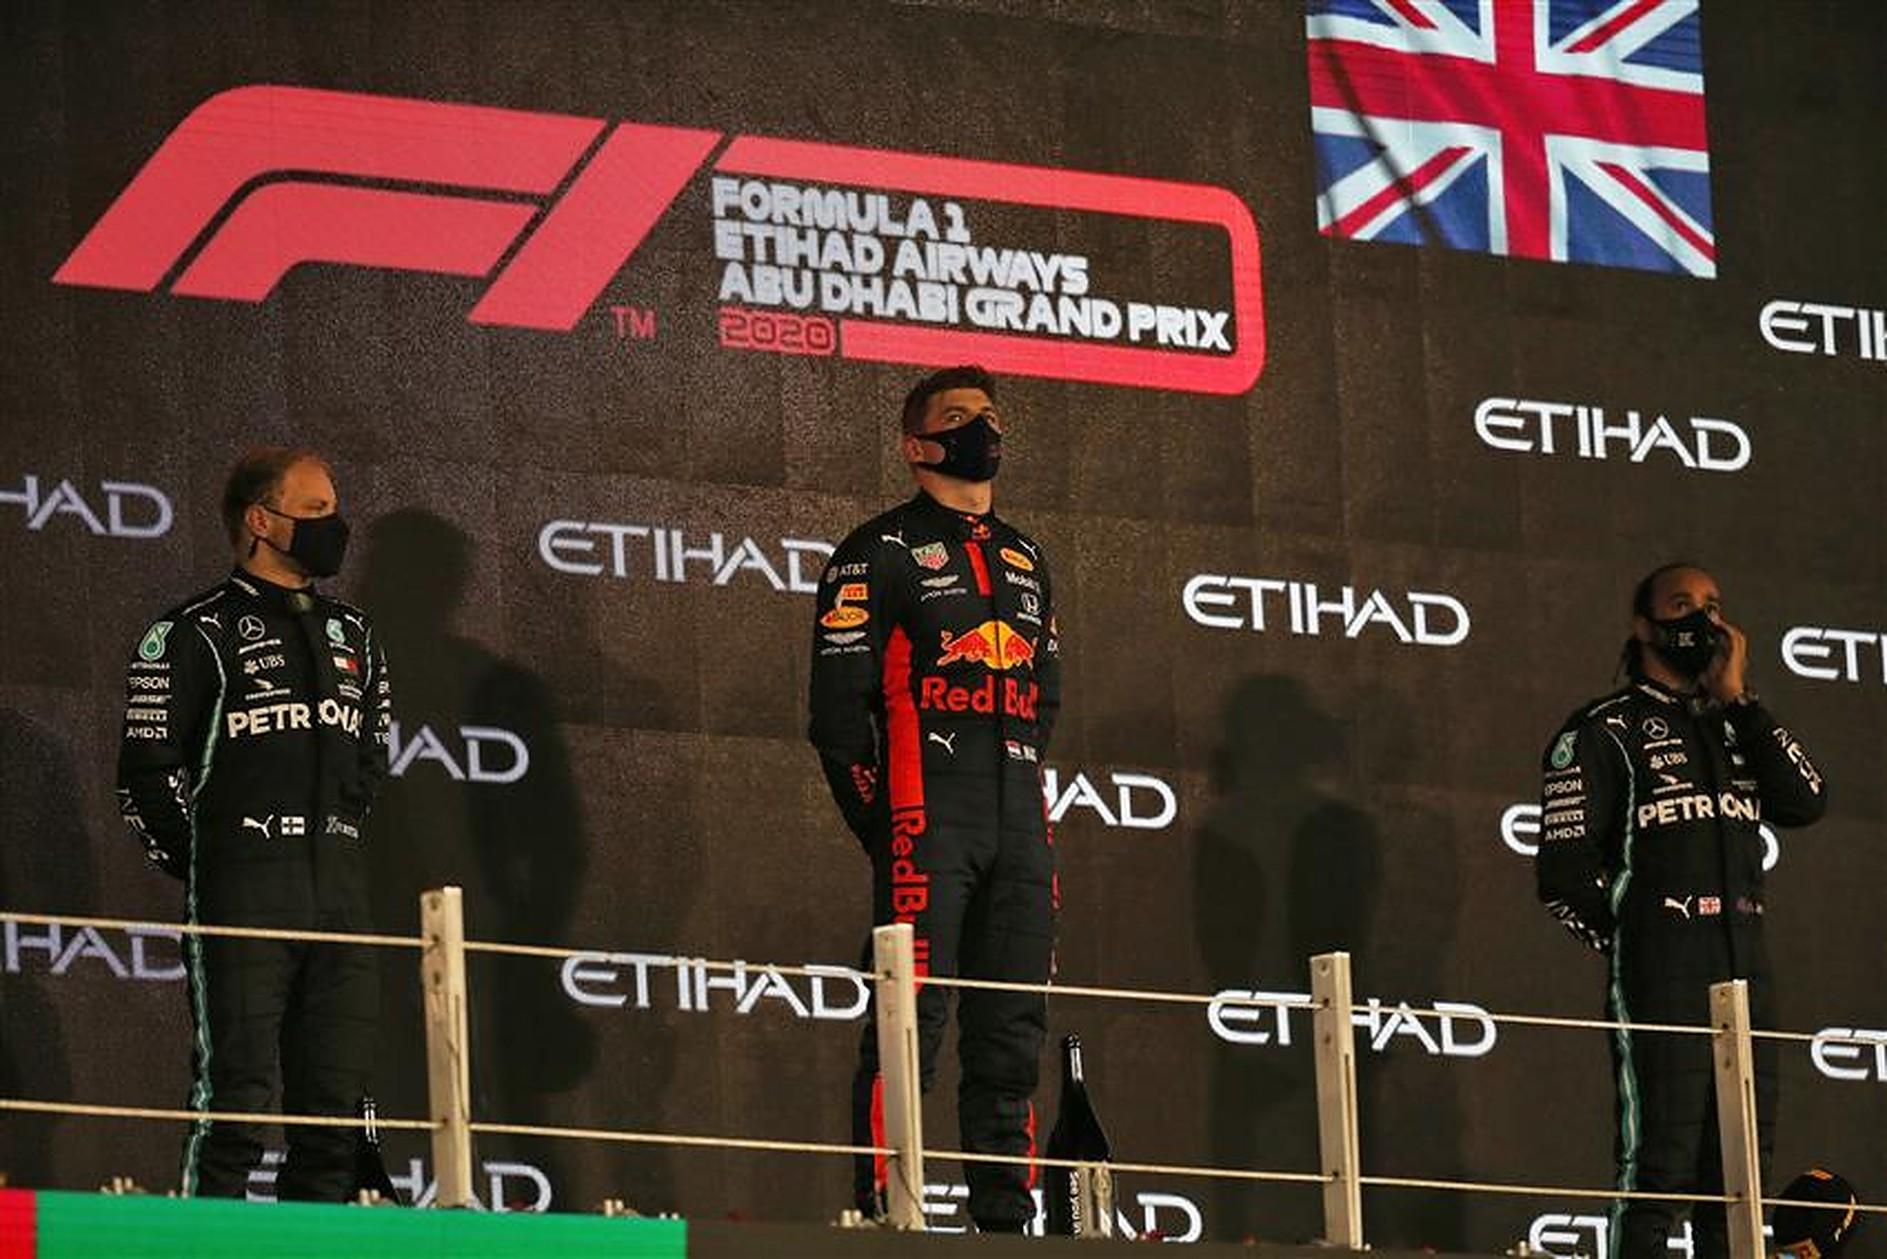 Max Verstappen and Lewis Hamilton at Mercedes battle - Formula1news.co.uk